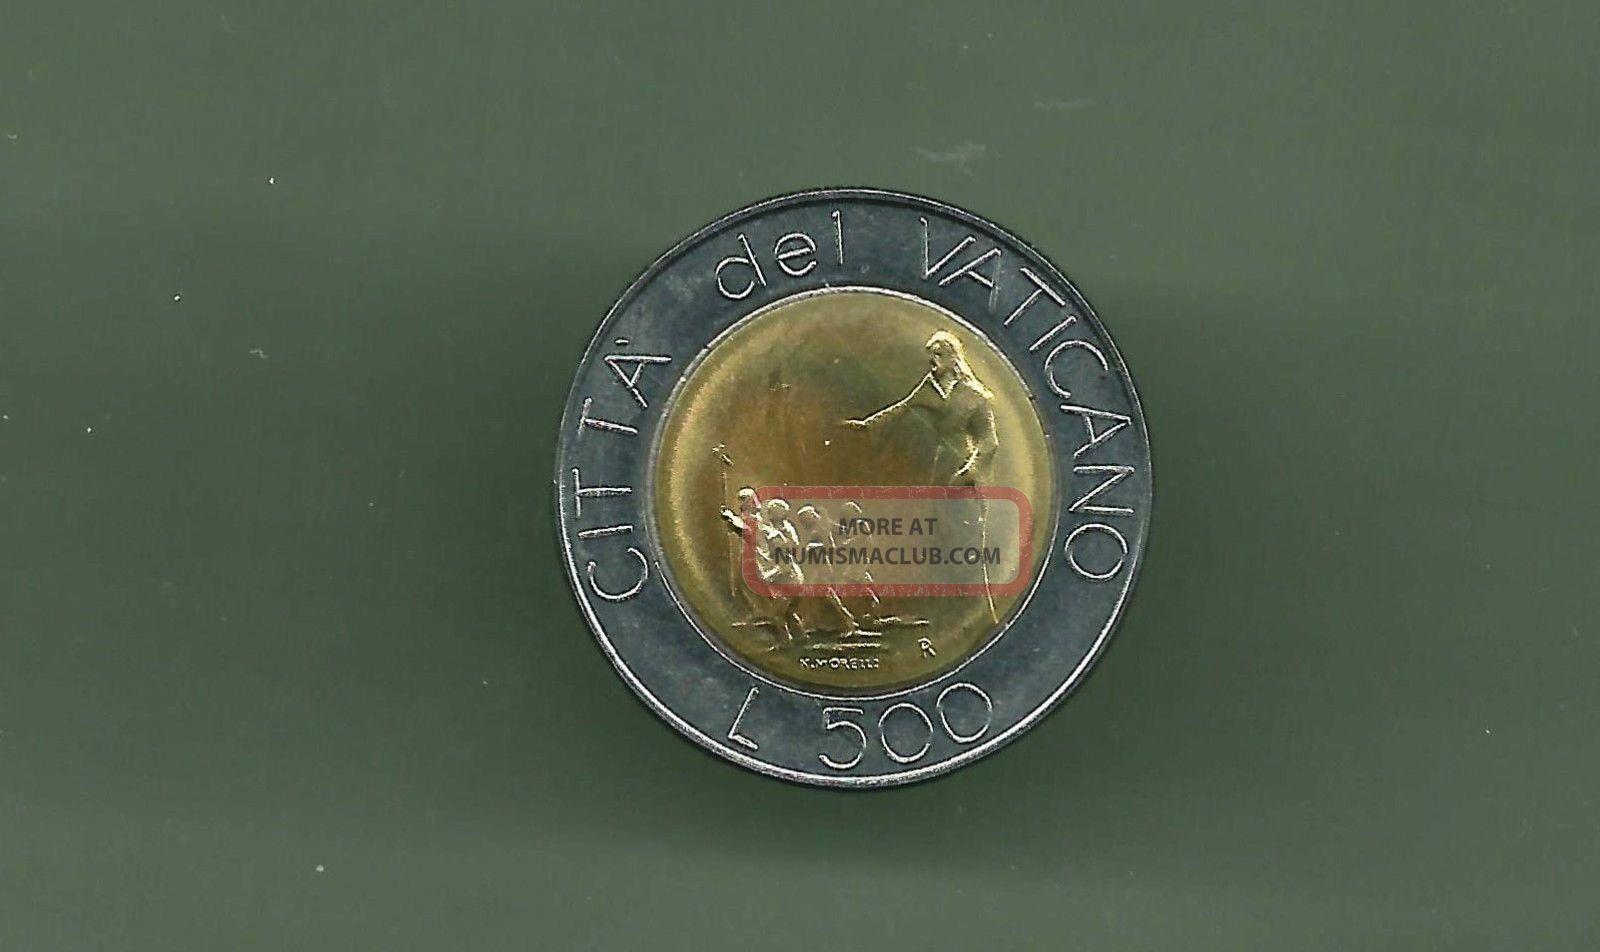 Vatican 1991 500 Lire Bi - Metallic Unc Coin Italy, San Marino, Vatican photo